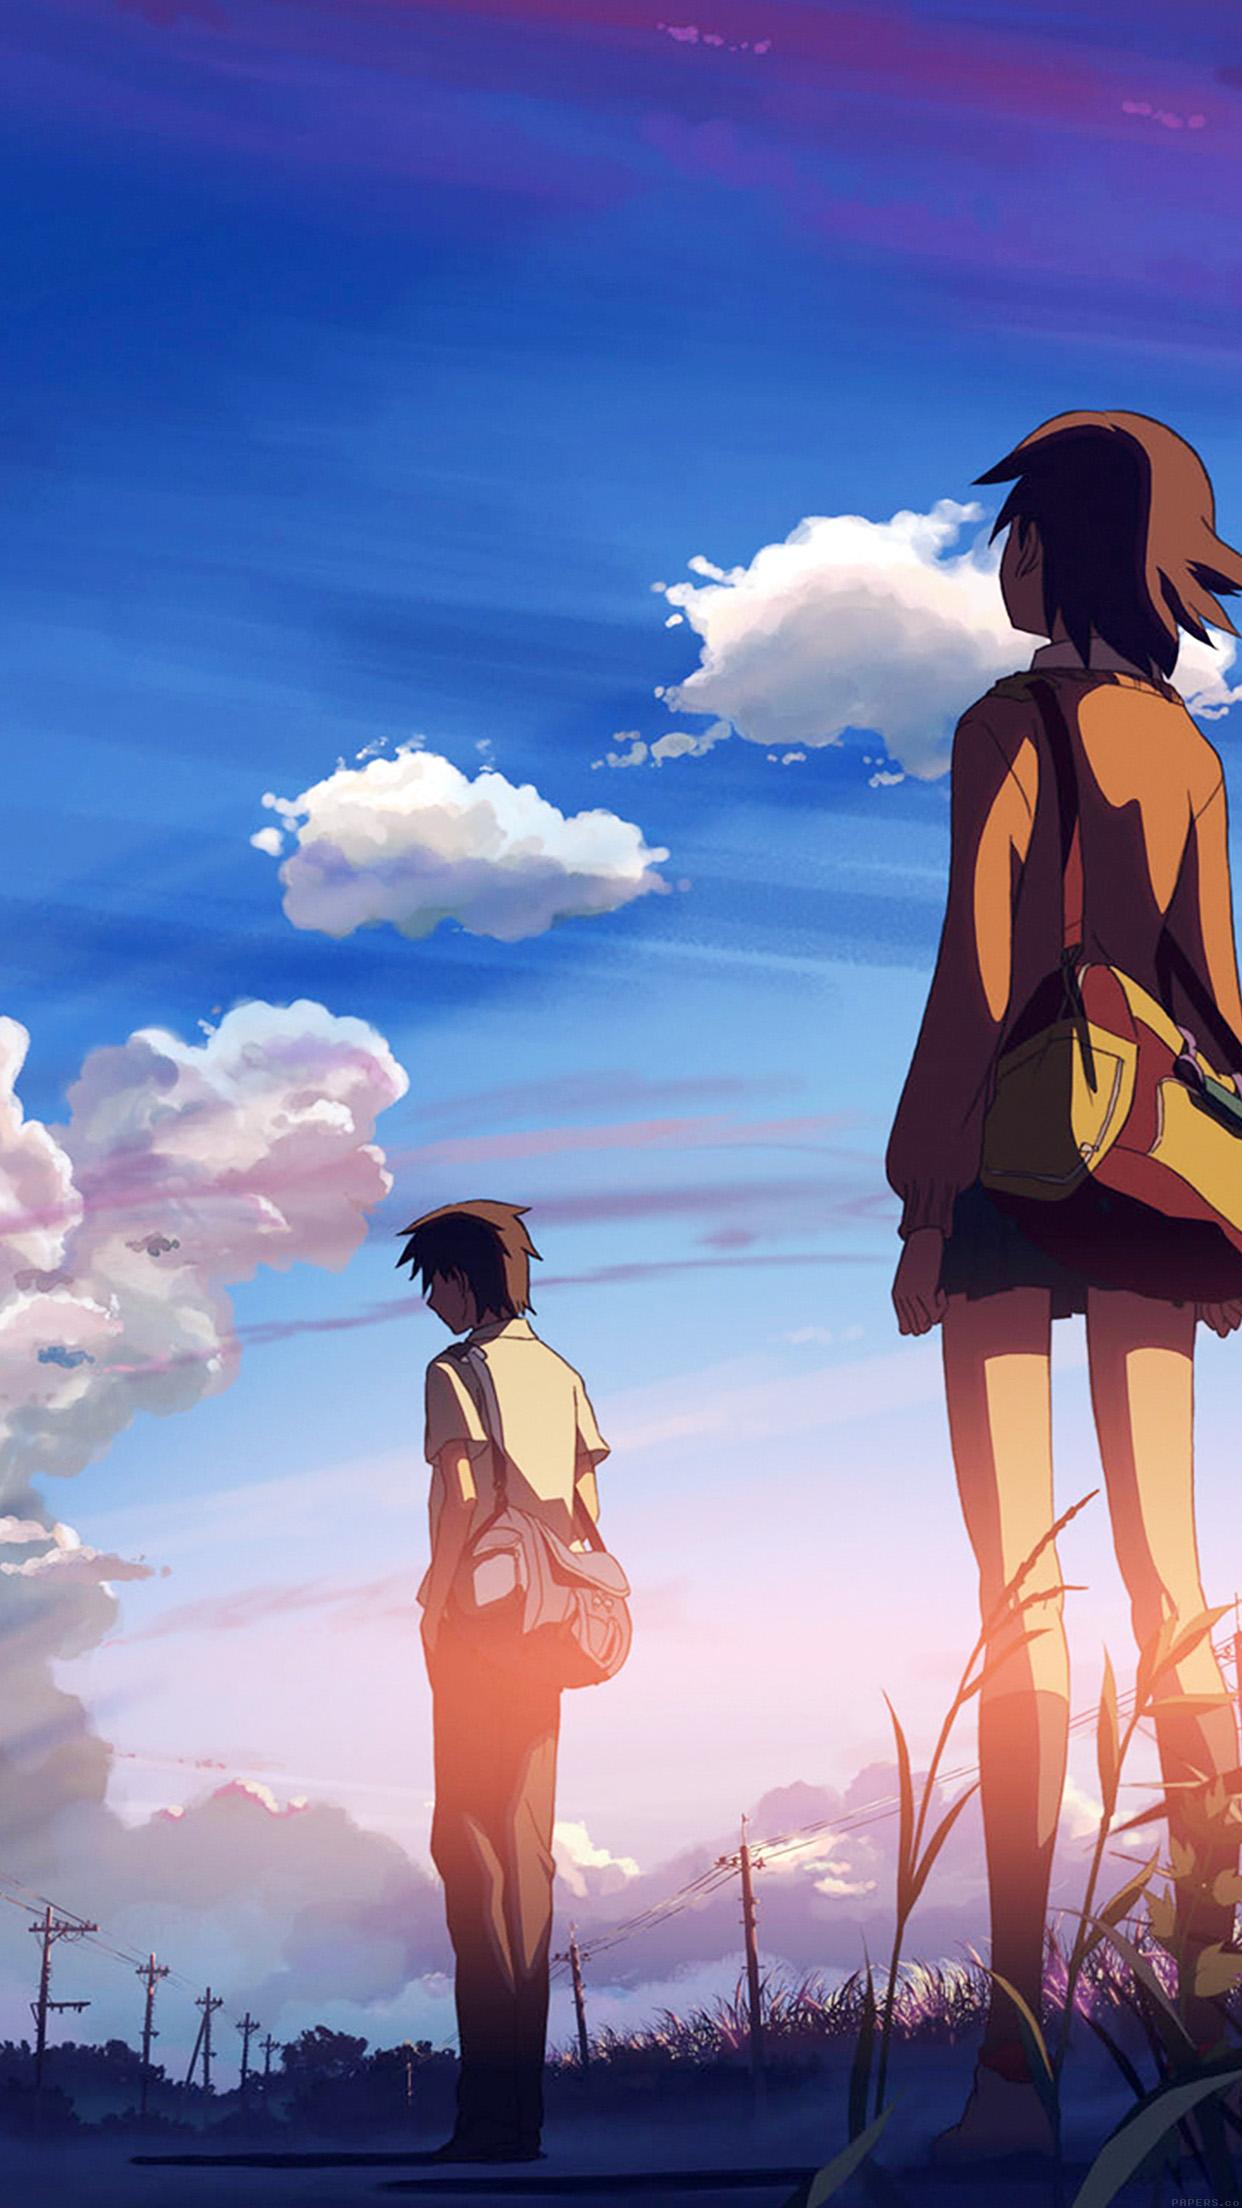 Iphone6papers Aj44 Departure Love Anime Illust Art